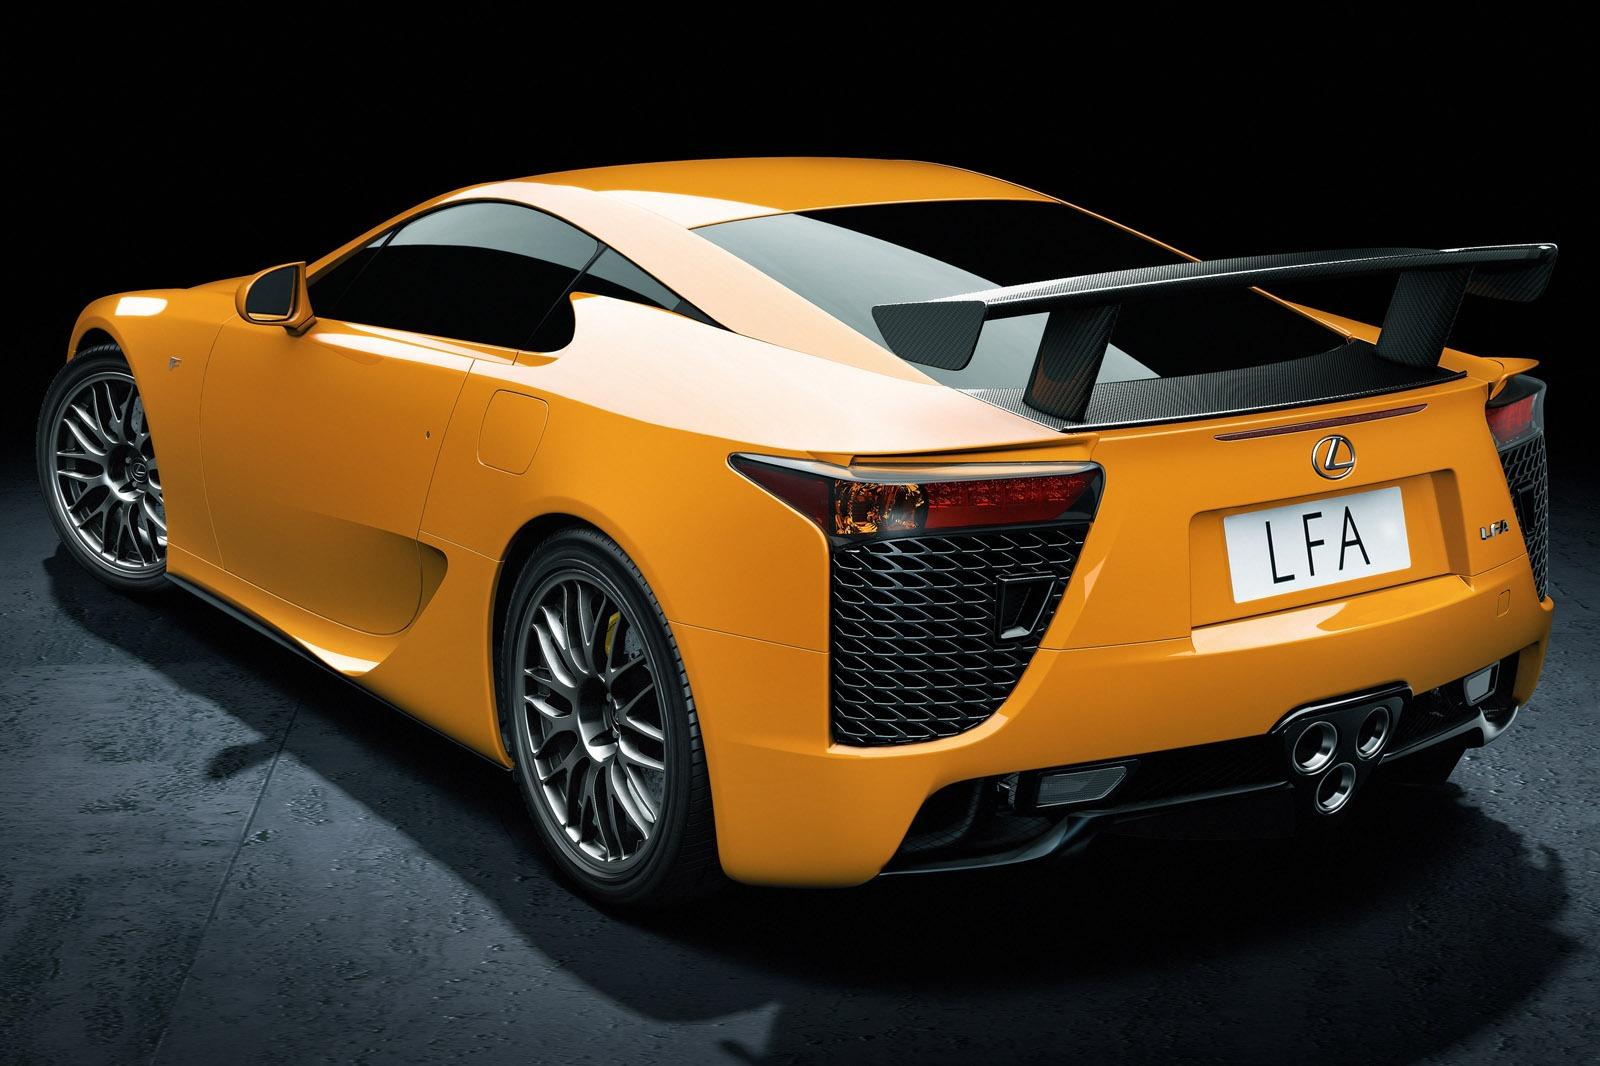 http://images.caradisiac.com/images/5/9/0/6/65906/S0-Geneve-2011-la-Lexus-LFA-Nurburgring-Edition-exposee-212389.jpg